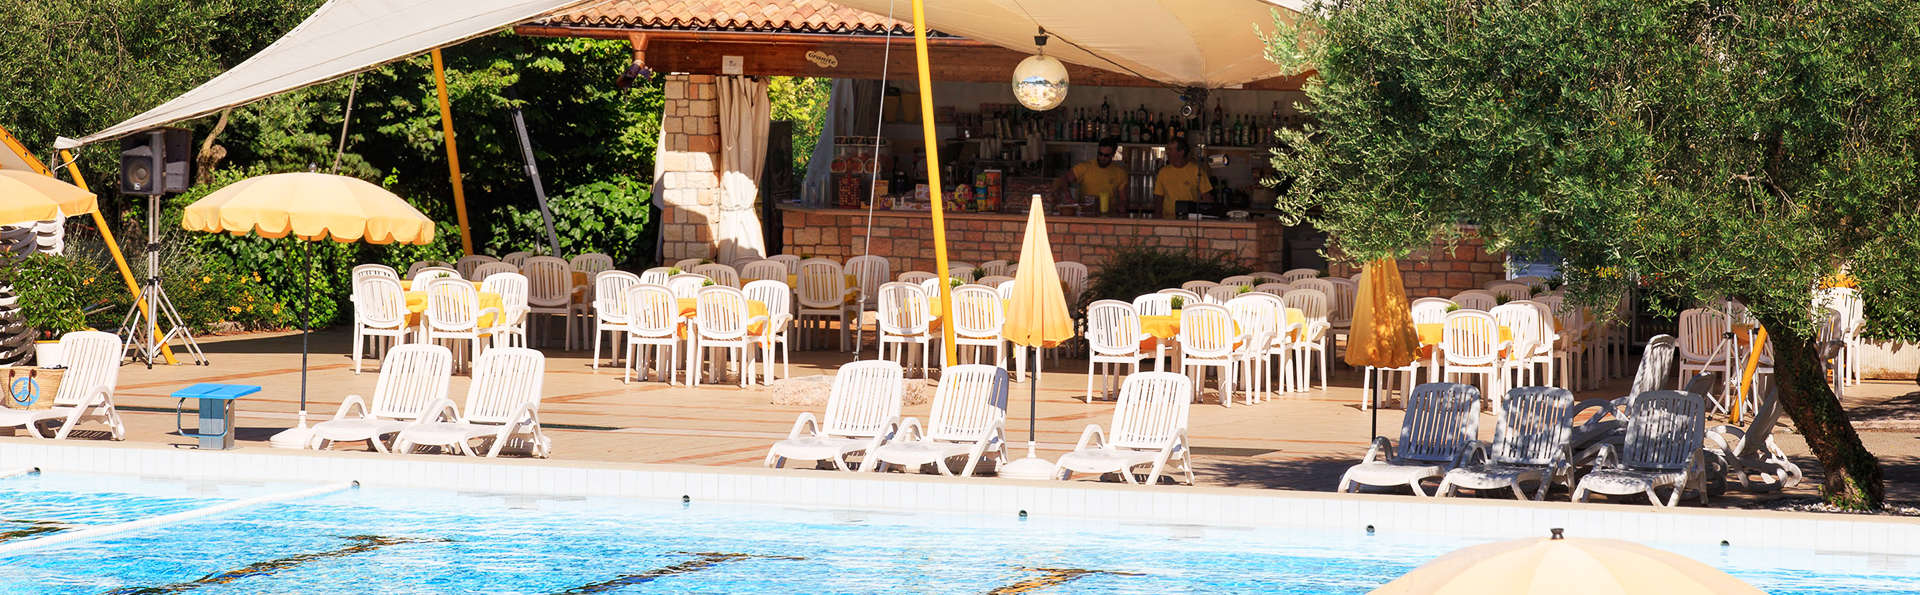 Poiano Resort - EDIT_pool.jpg